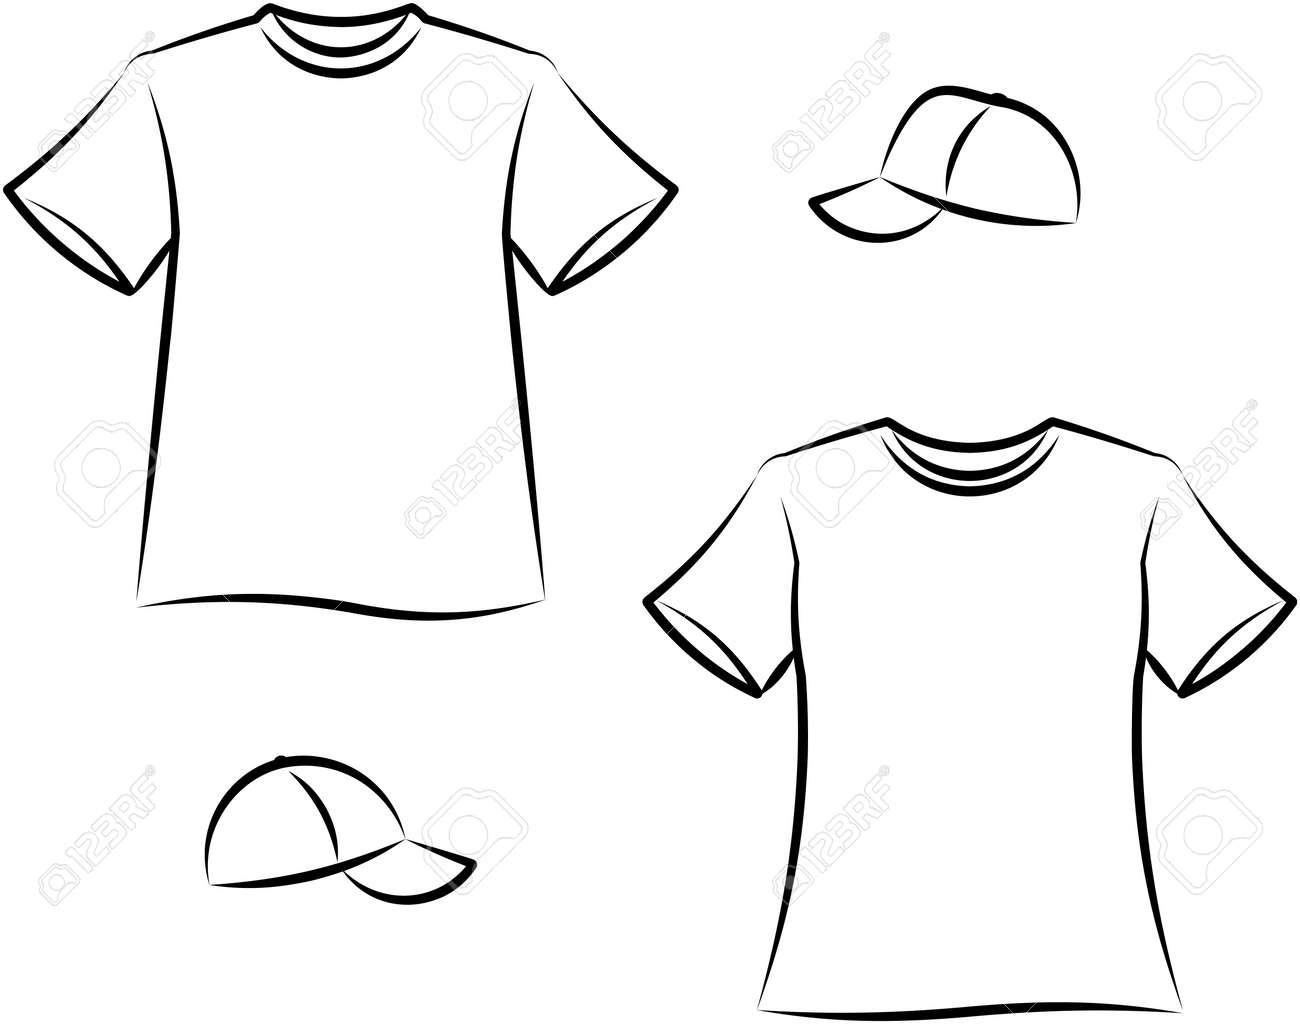 Apparel for men and women. Vector illustration - 9667571